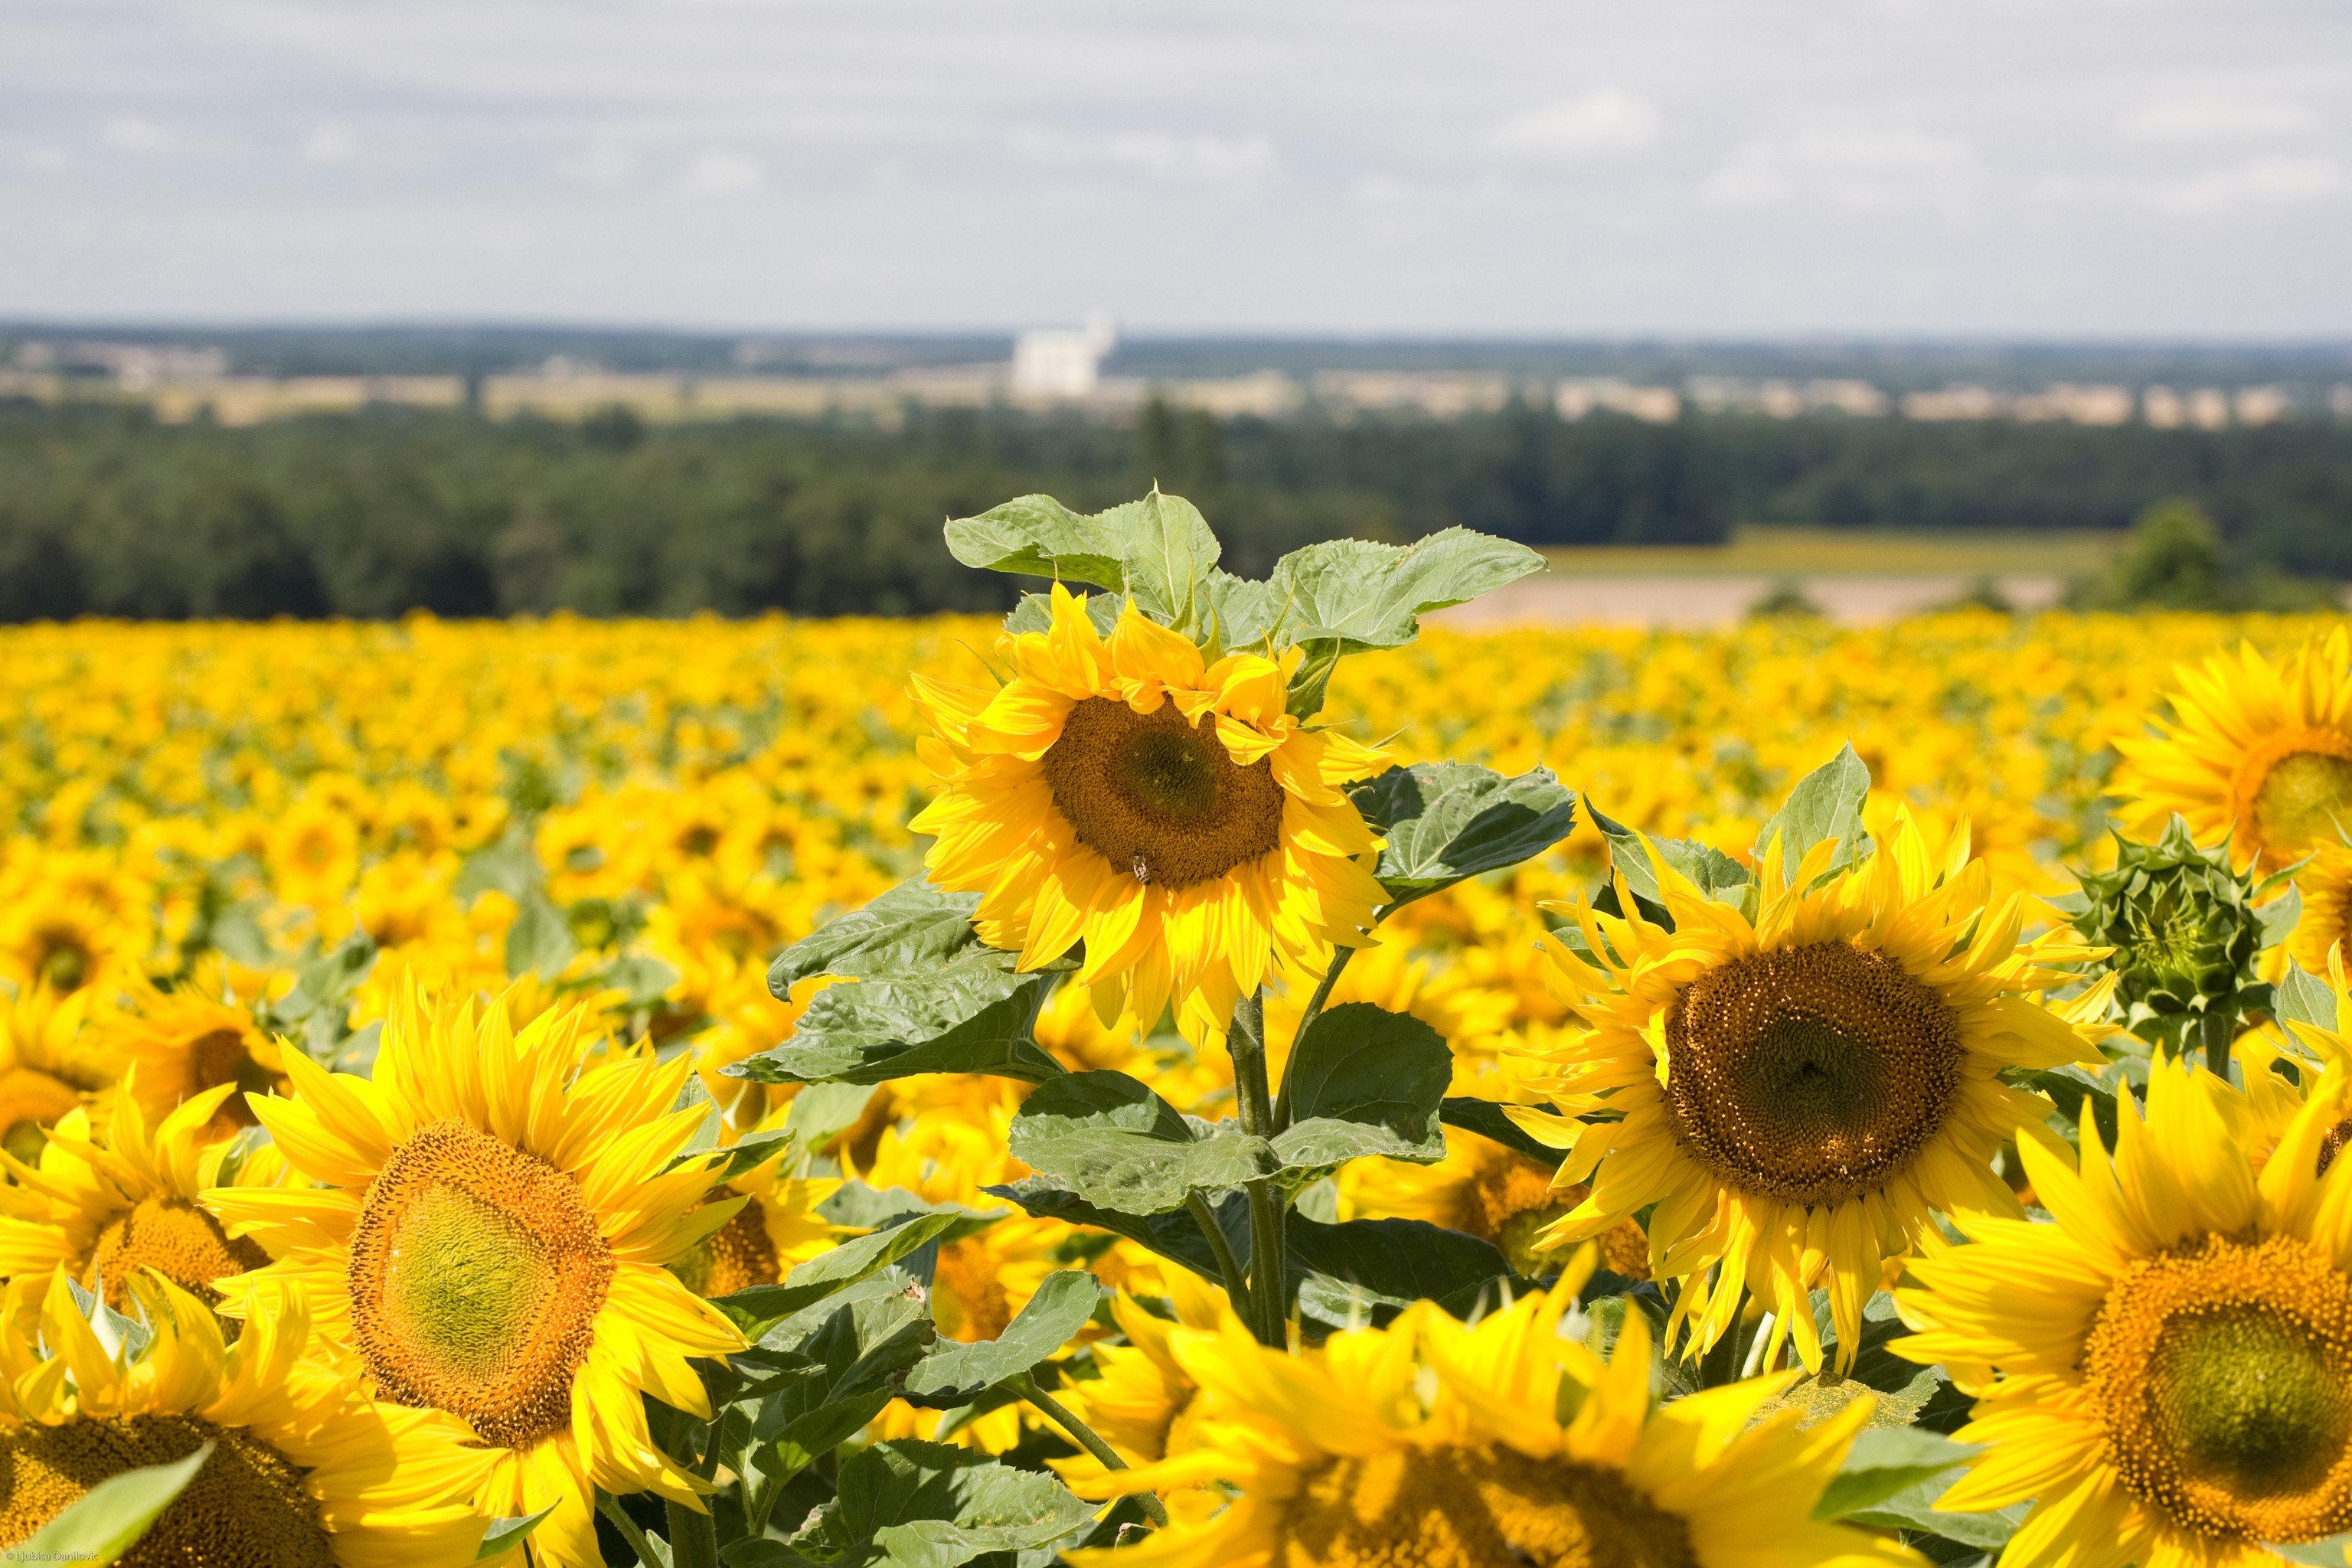 flower yellow sunflower plant field flora land plant flowering plant daisy family meadow prairie wildflower sunflower seed